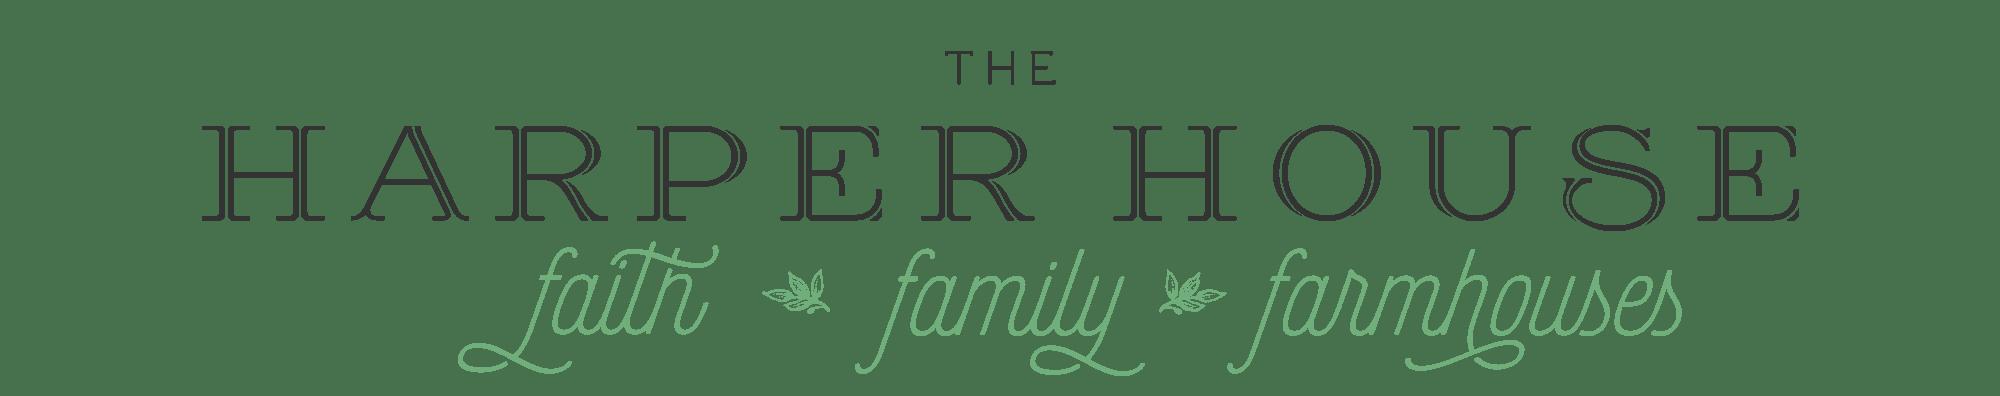 5 Favorite Fixer Upper Rugs The Harper House